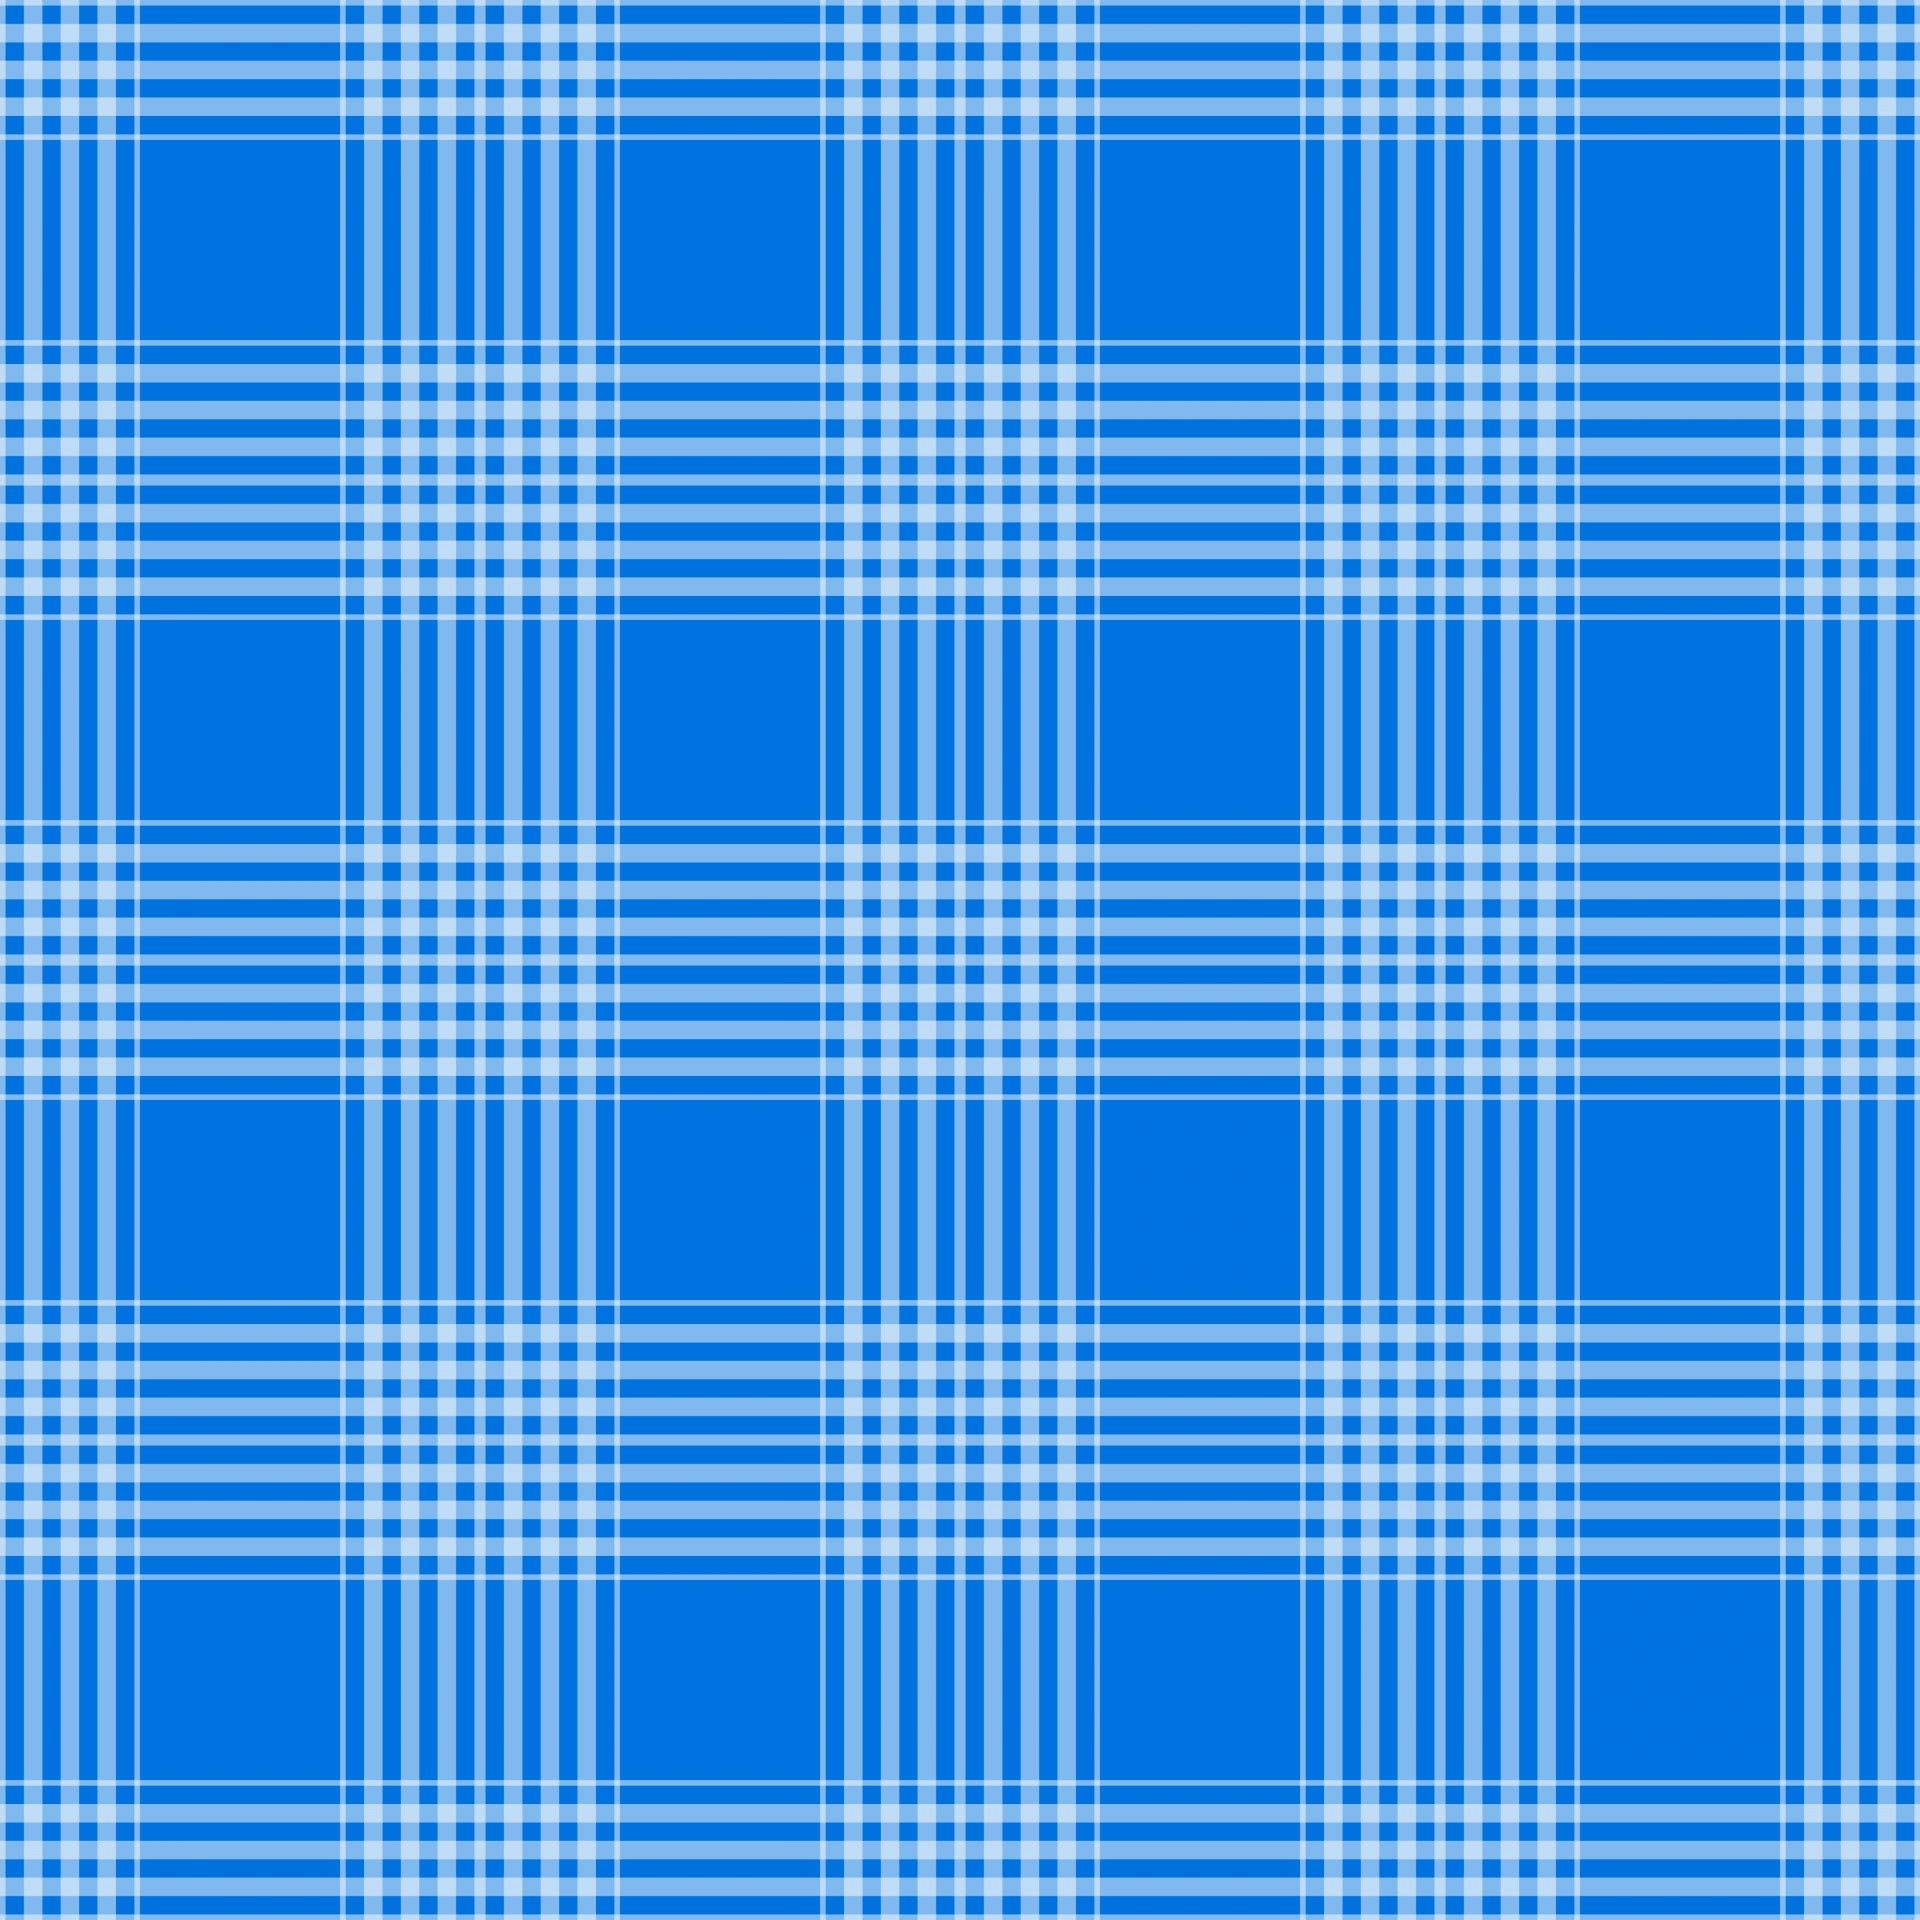 Plaid Checks Background Blue Free Stock Photo Blue